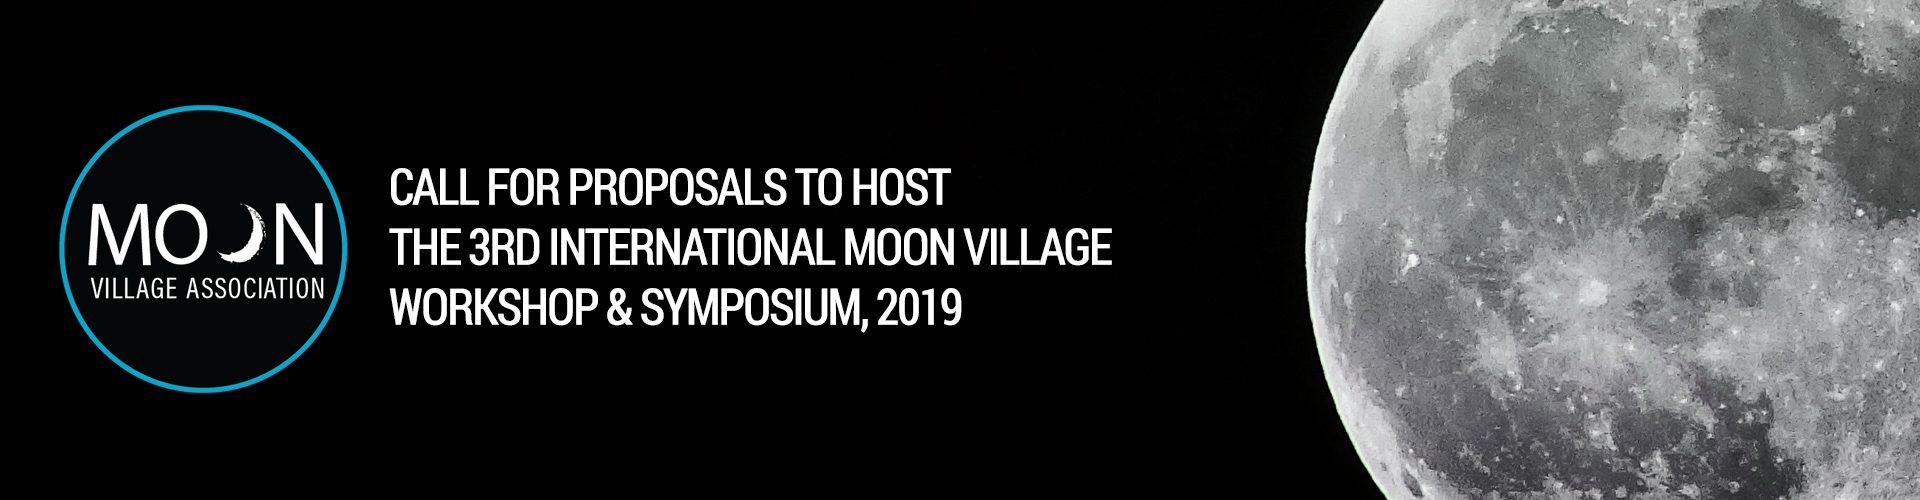 Moon Village Association